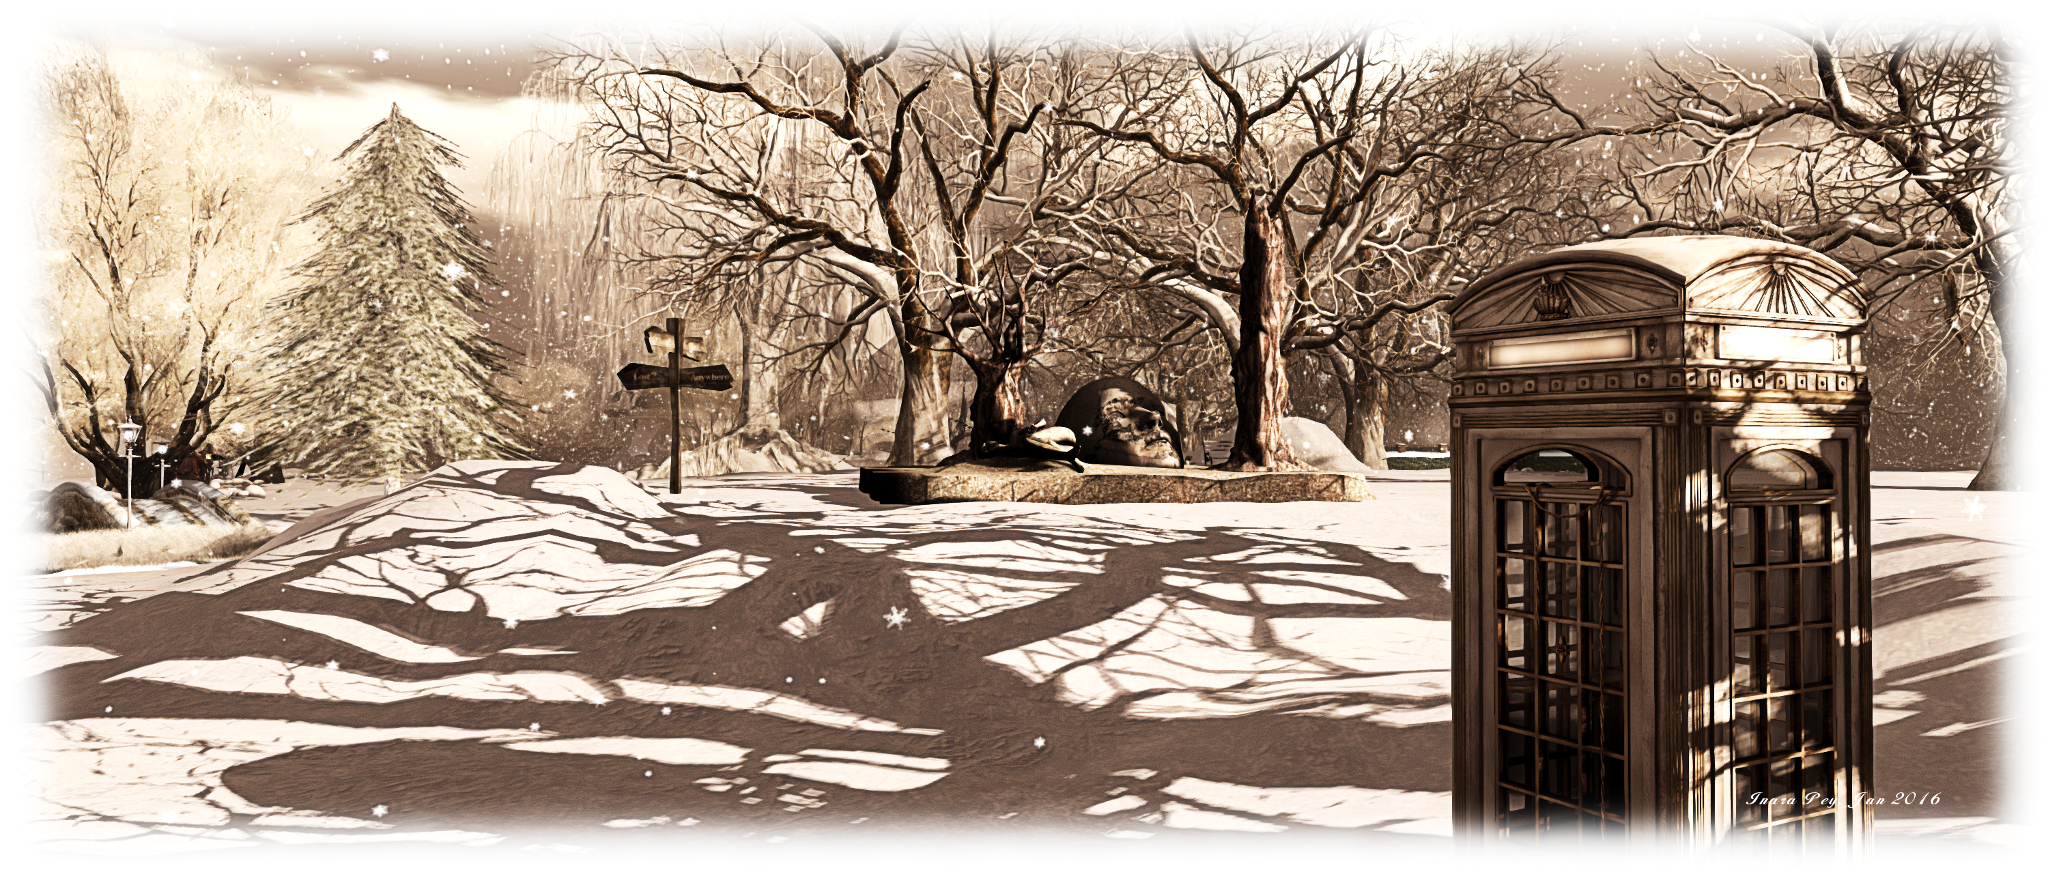 Gates of Memories; Inara Pey, January 2016, on Flickr